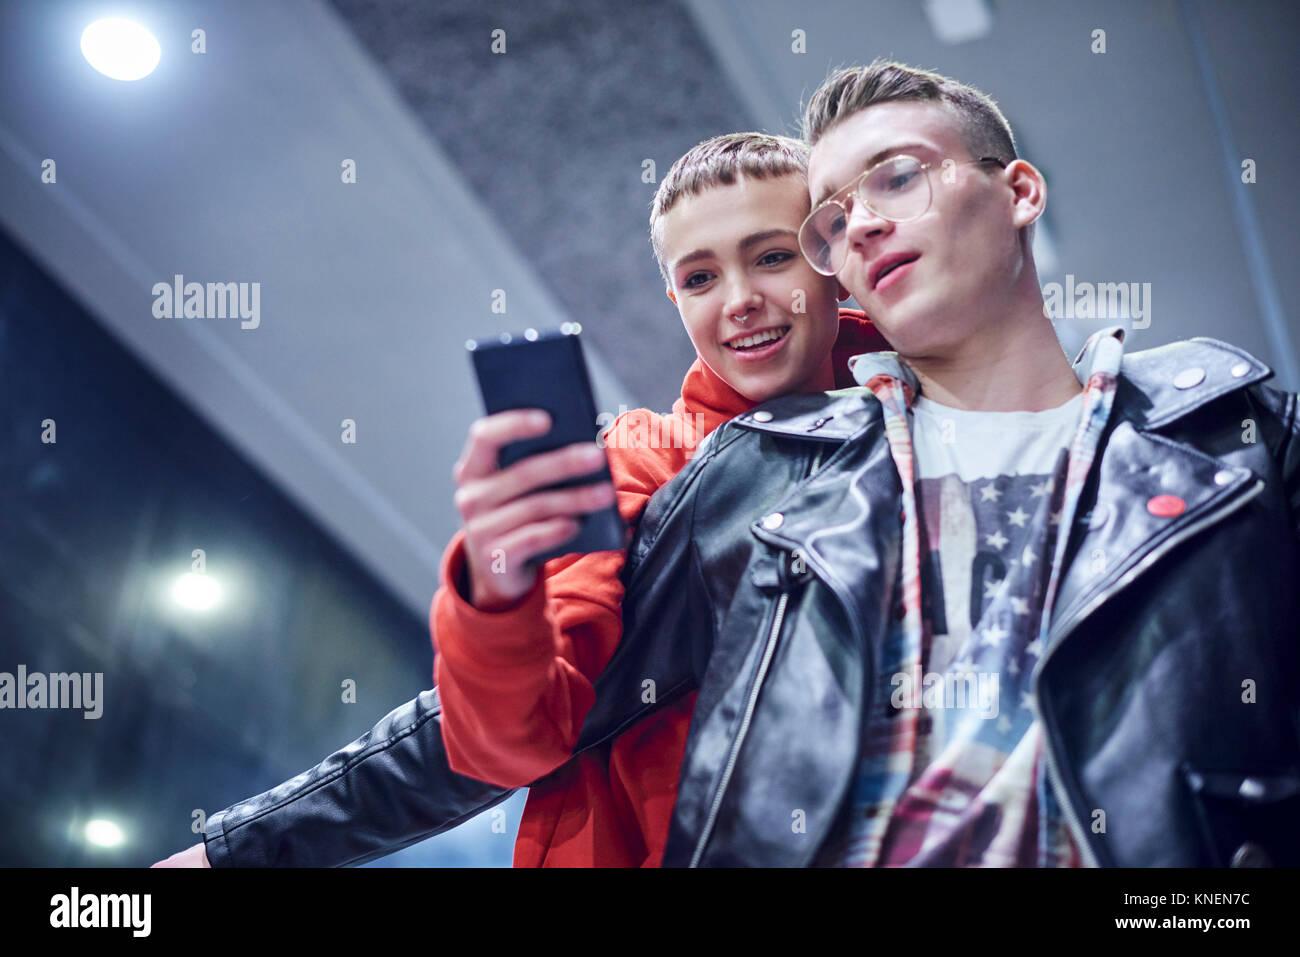 Jeune couple en descendant l'escalator de la station de métro looking at smartphone Photo Stock